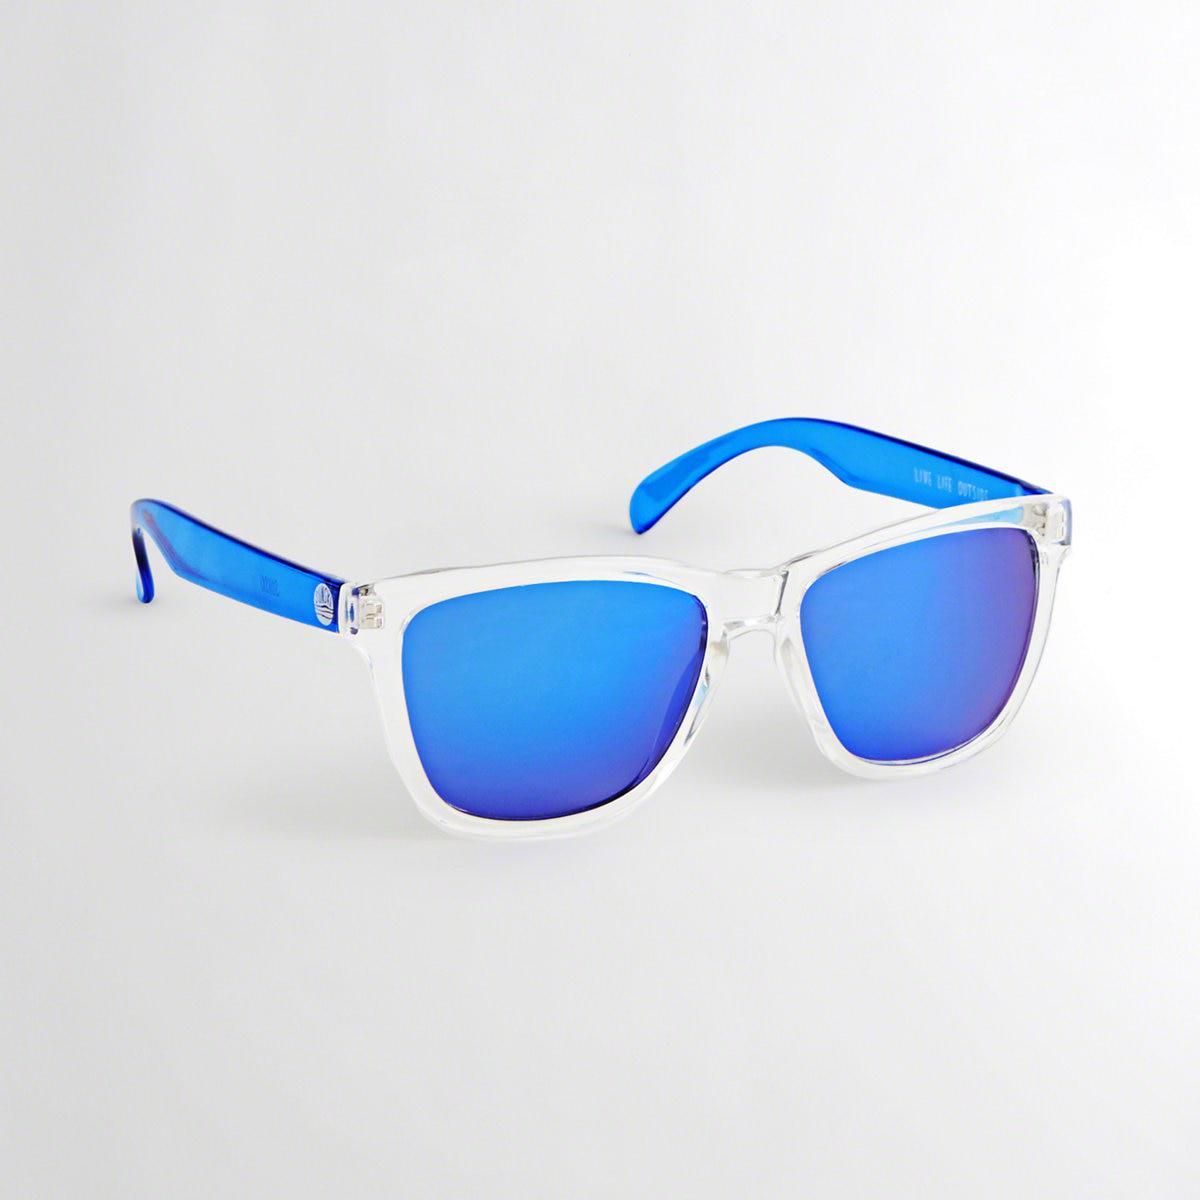 Guys Lyst In Sunski From Hollister Original Sunglasses NnO8vm0w